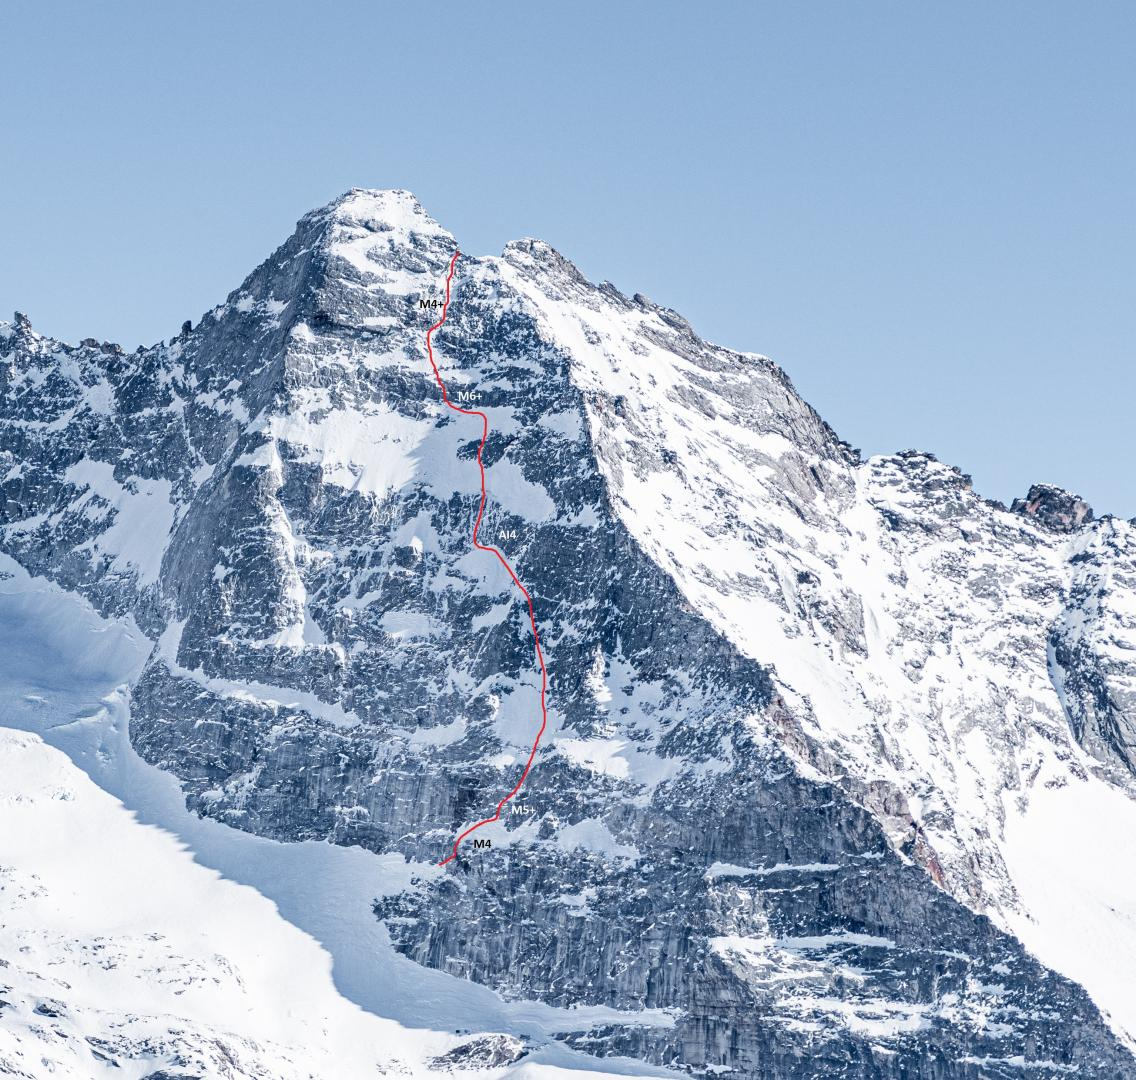 Winter-Variante am Fußstein (Valsertal, Tirol)